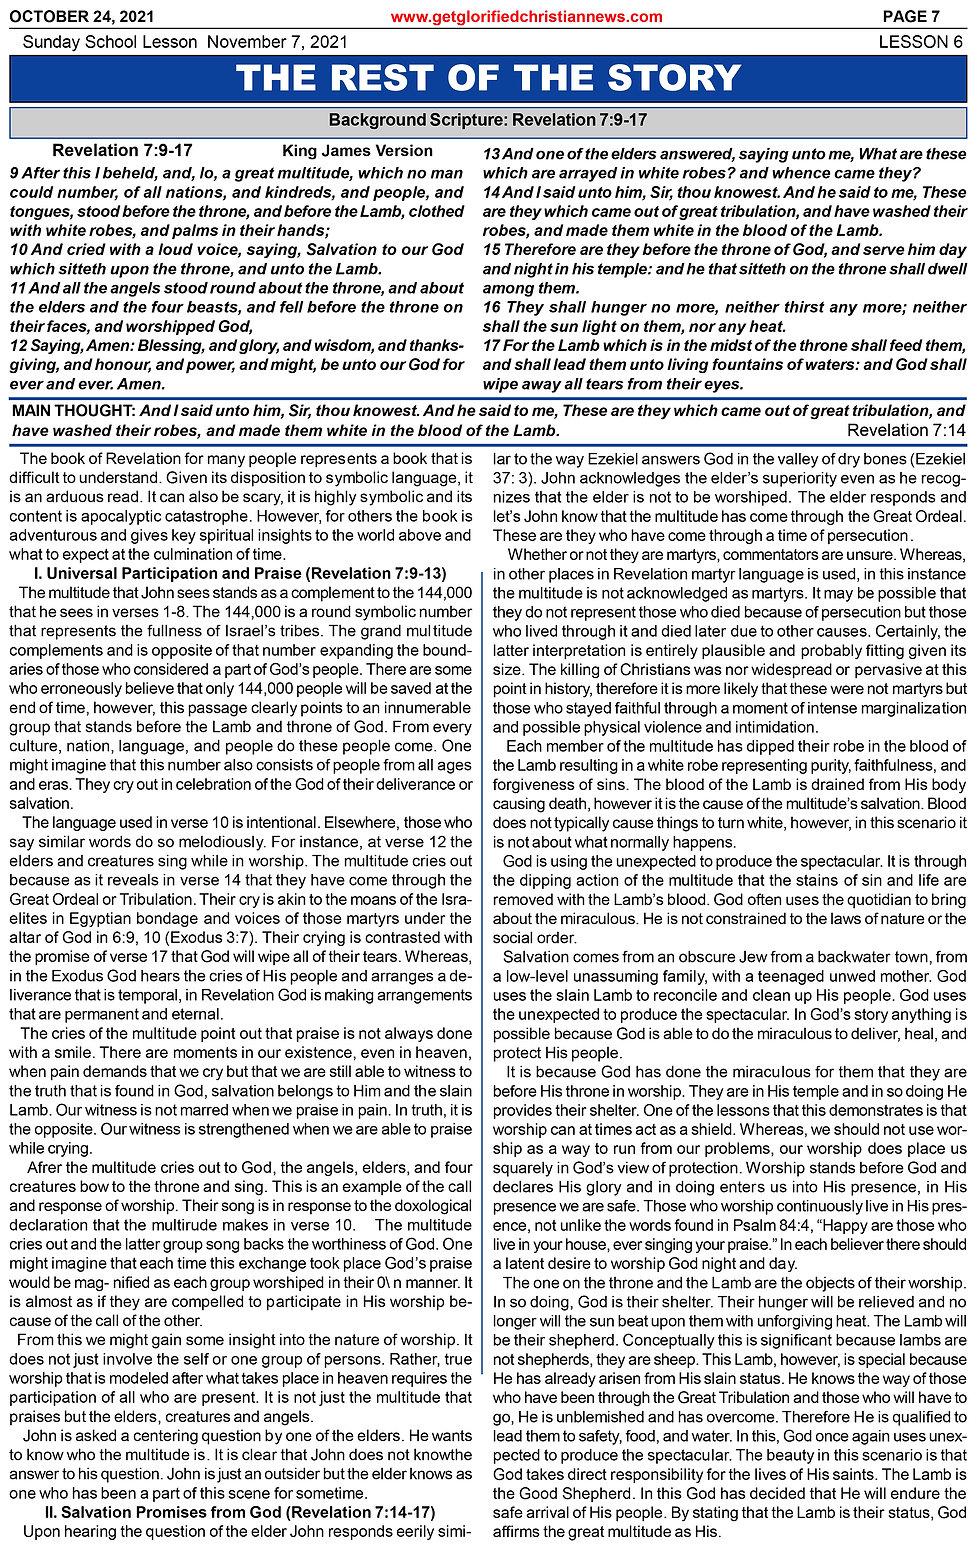 GCT 10-24-21 Page 7.jpg